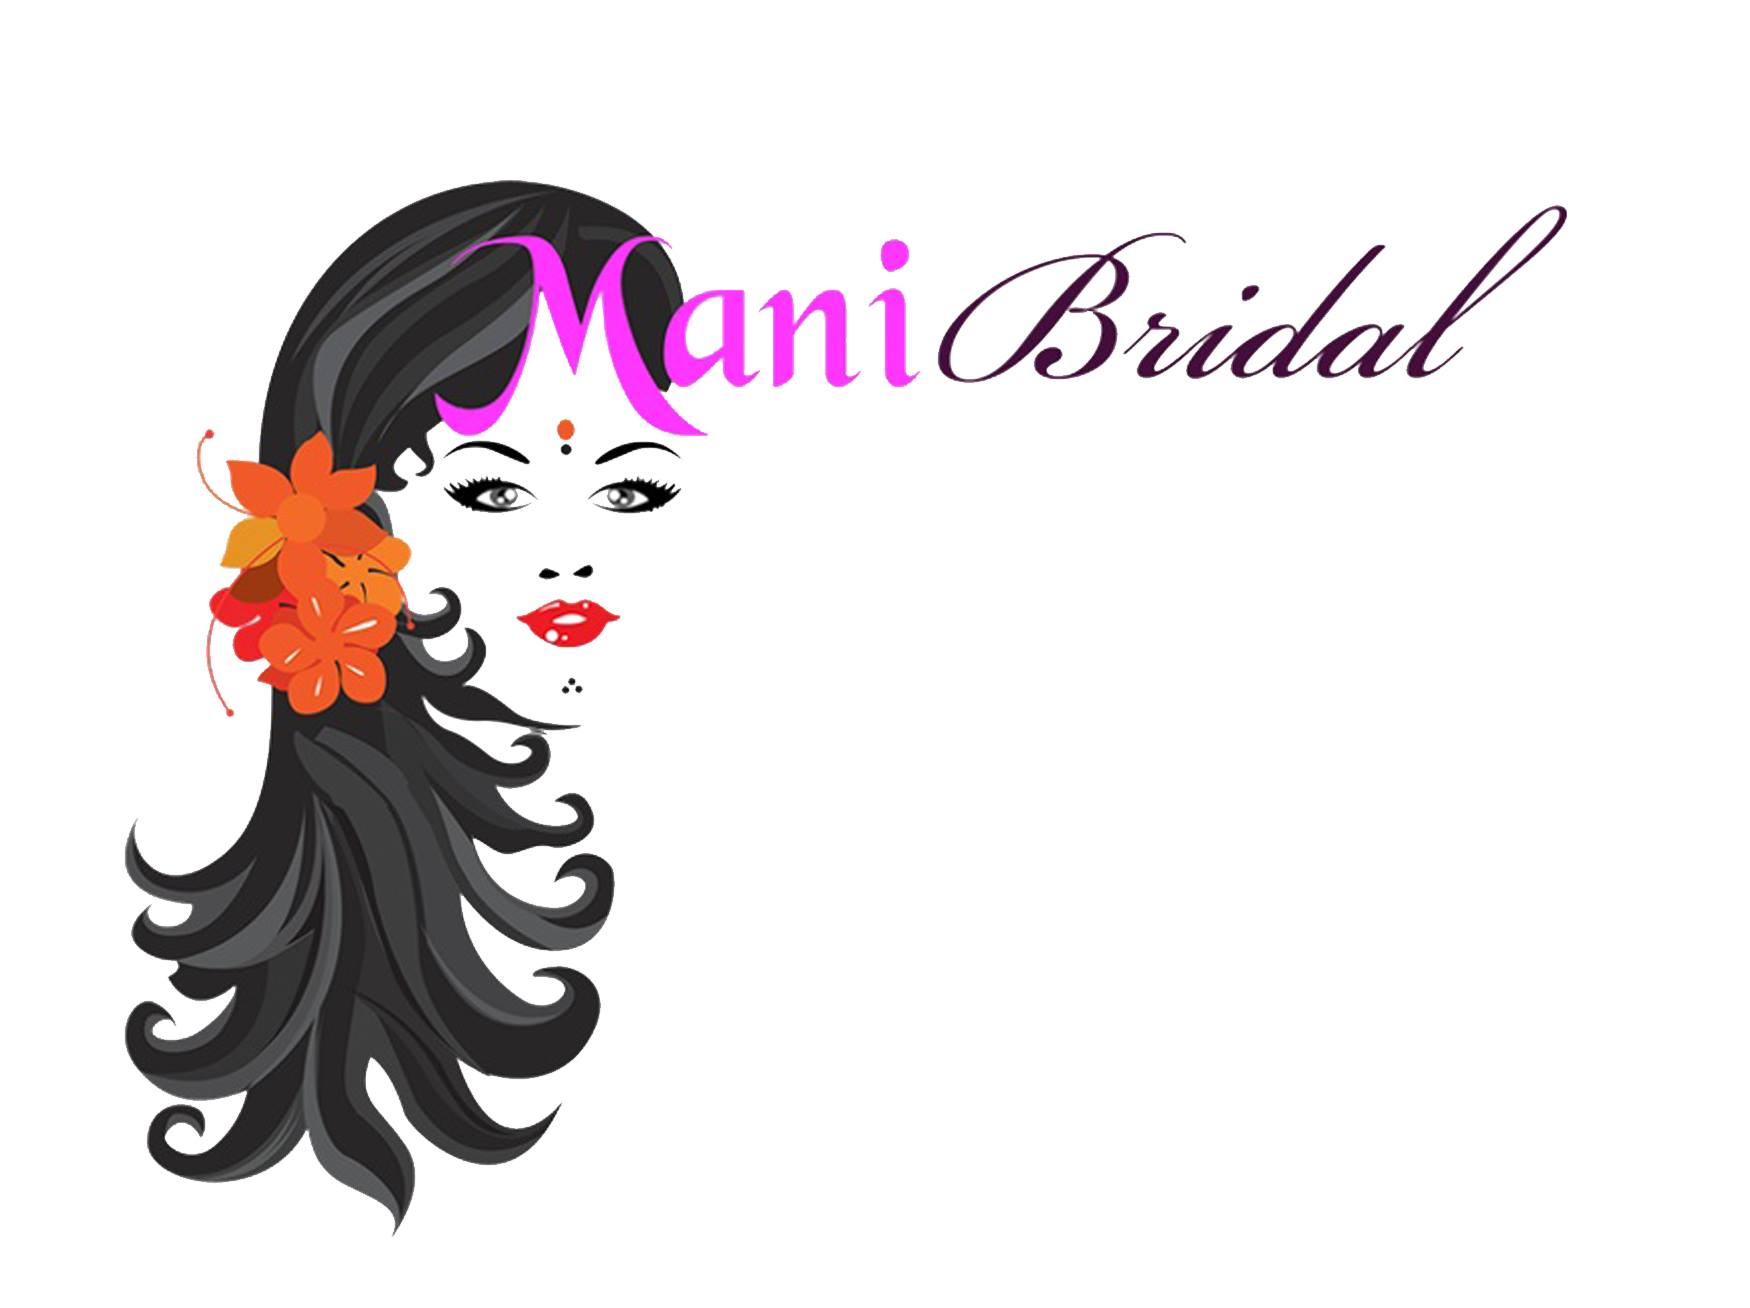 Mani Bridal